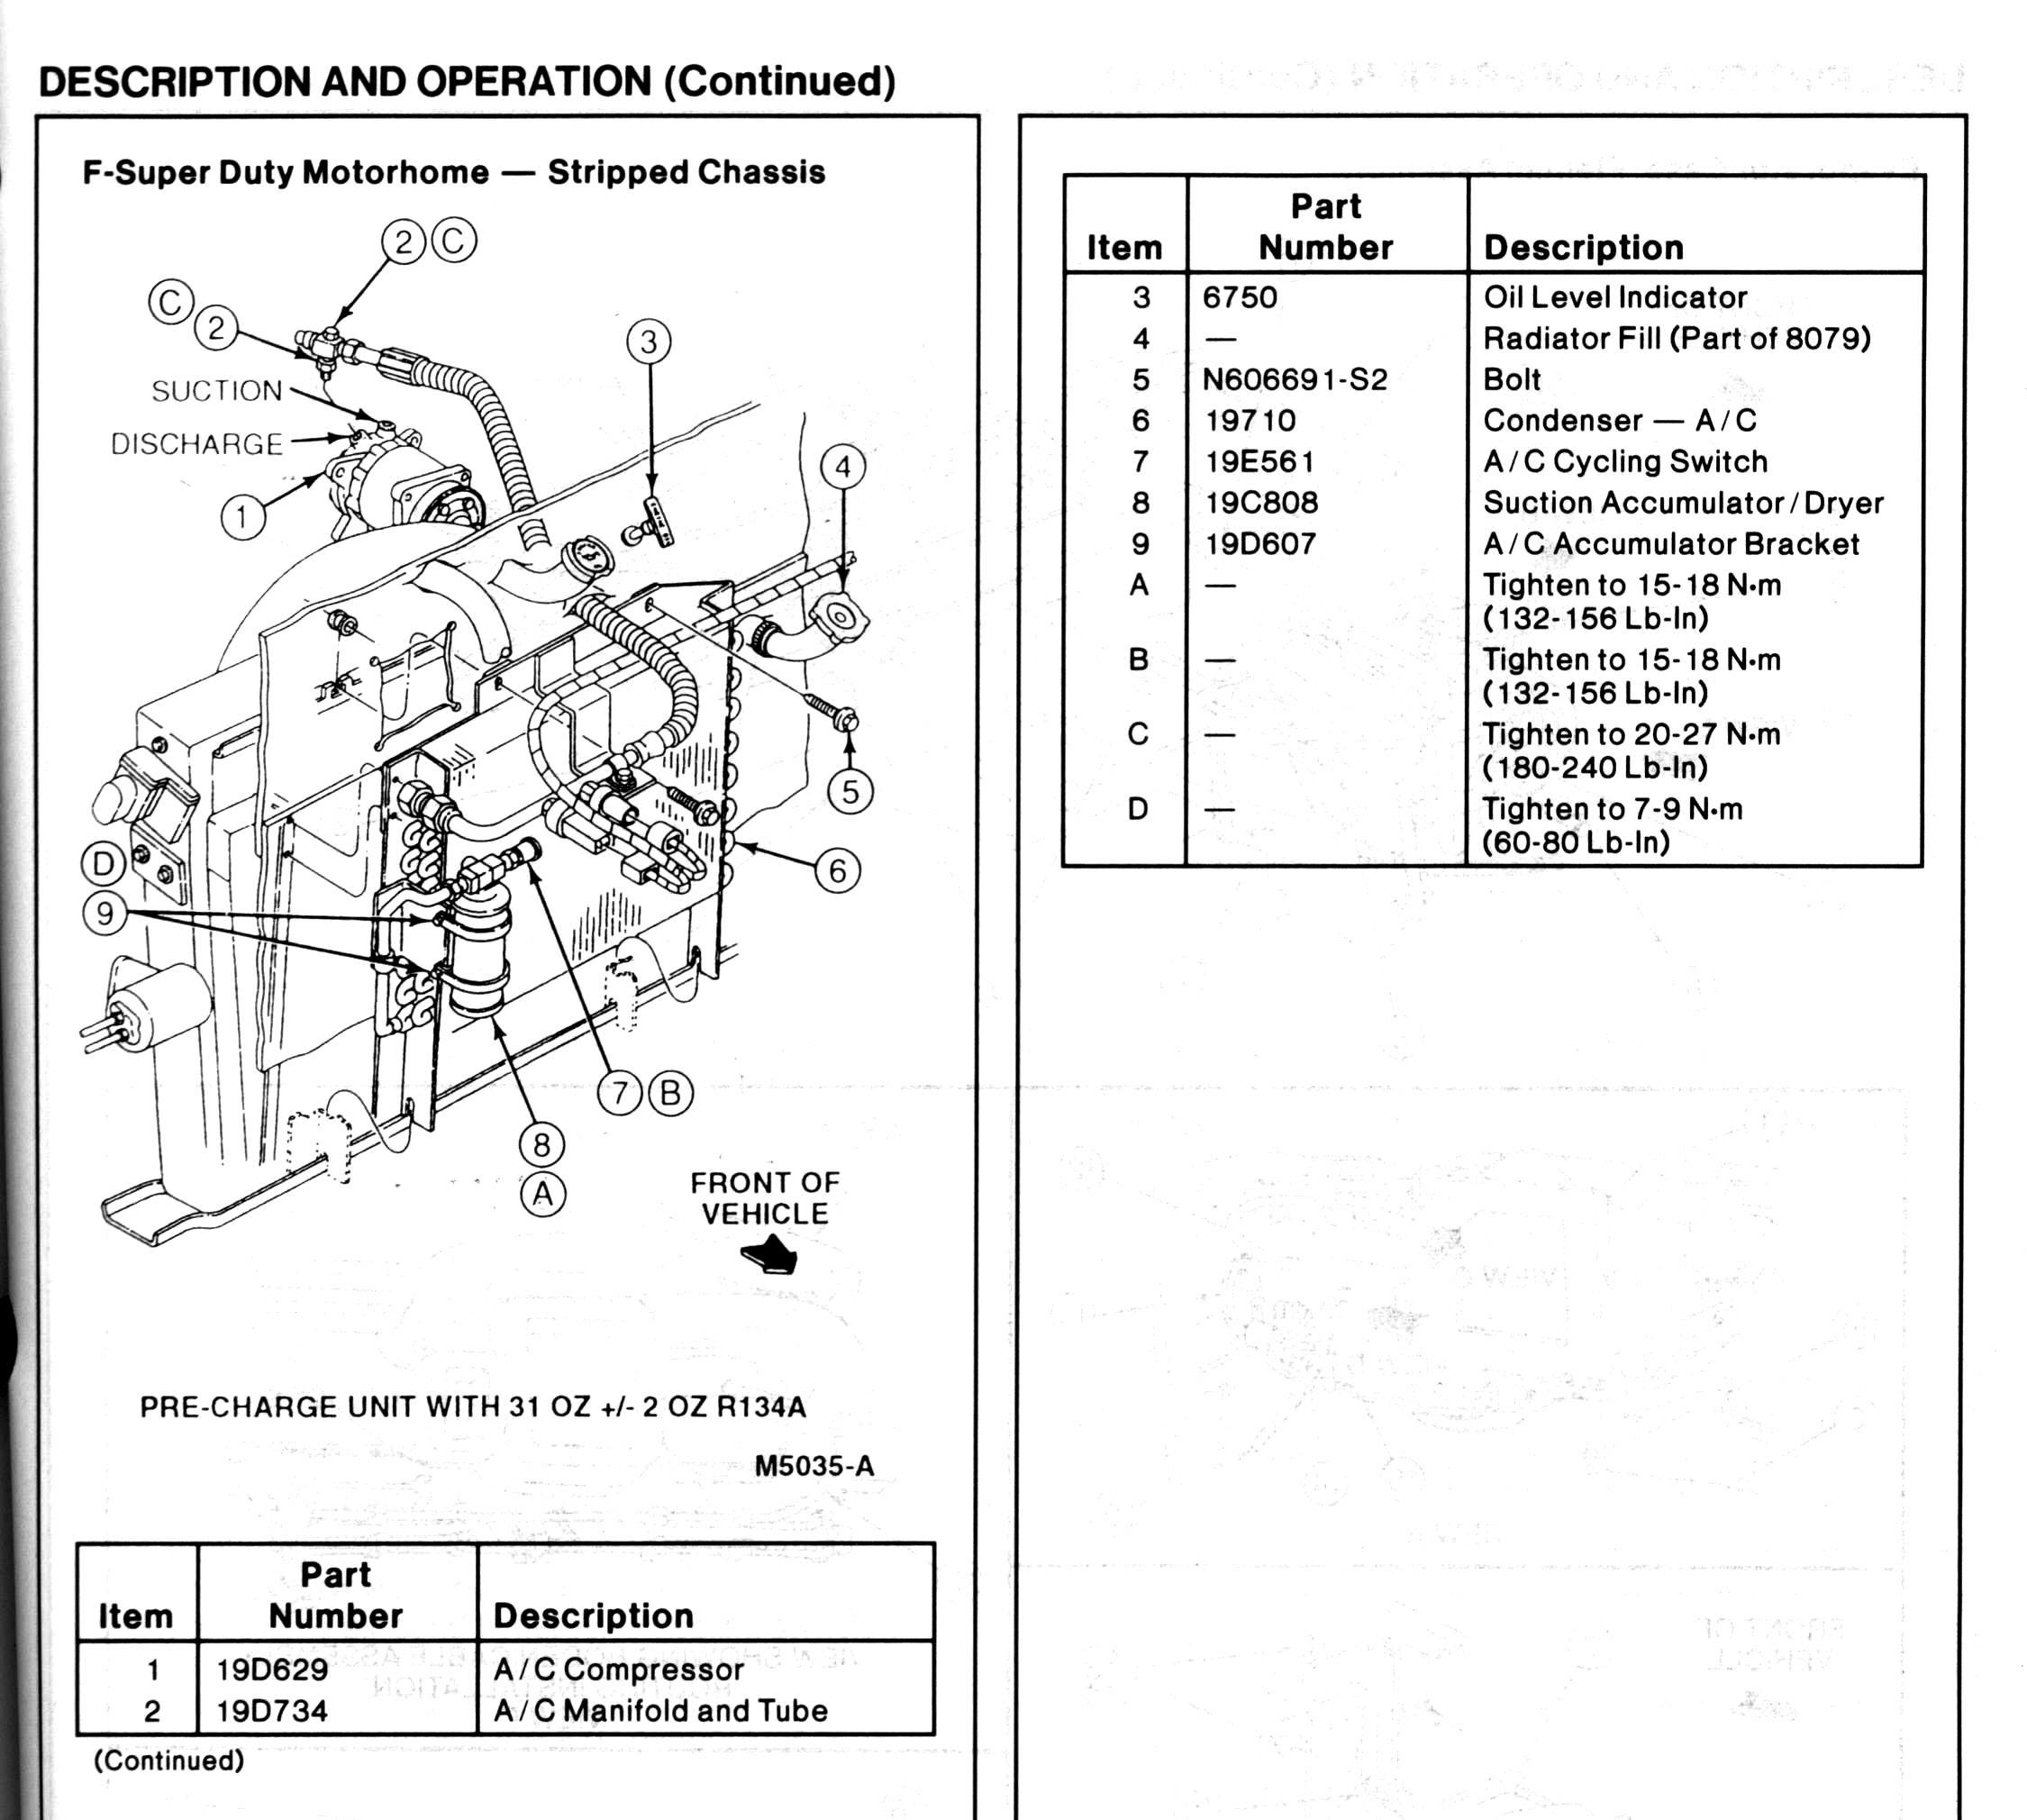 1995 Ford F53 Wiring Diagram | Wiring Diagram Liry  Ford F Chis Wiring Diagram on 1995 ford crown victoria wiring diagram, 1995 ford explorer wiring diagram, 1995 ford probe wiring diagram, 1995 ford windstar wiring diagram, 1995 ford aspire wiring diagram, 1995 ford f-150 wiring diagram, 1995 ford ranger wiring diagram, 1995 ford f800 wiring diagram, 1995 ford aerostar wiring diagram, 1995 ford mustang wiring diagram, 1995 ford e-350 wiring diagram, 1995 ford taurus wiring diagram, 1995 ford f-350 wiring diagram, 1995 ford bronco wiring diagram, 1995 ford econoline wiring diagram,